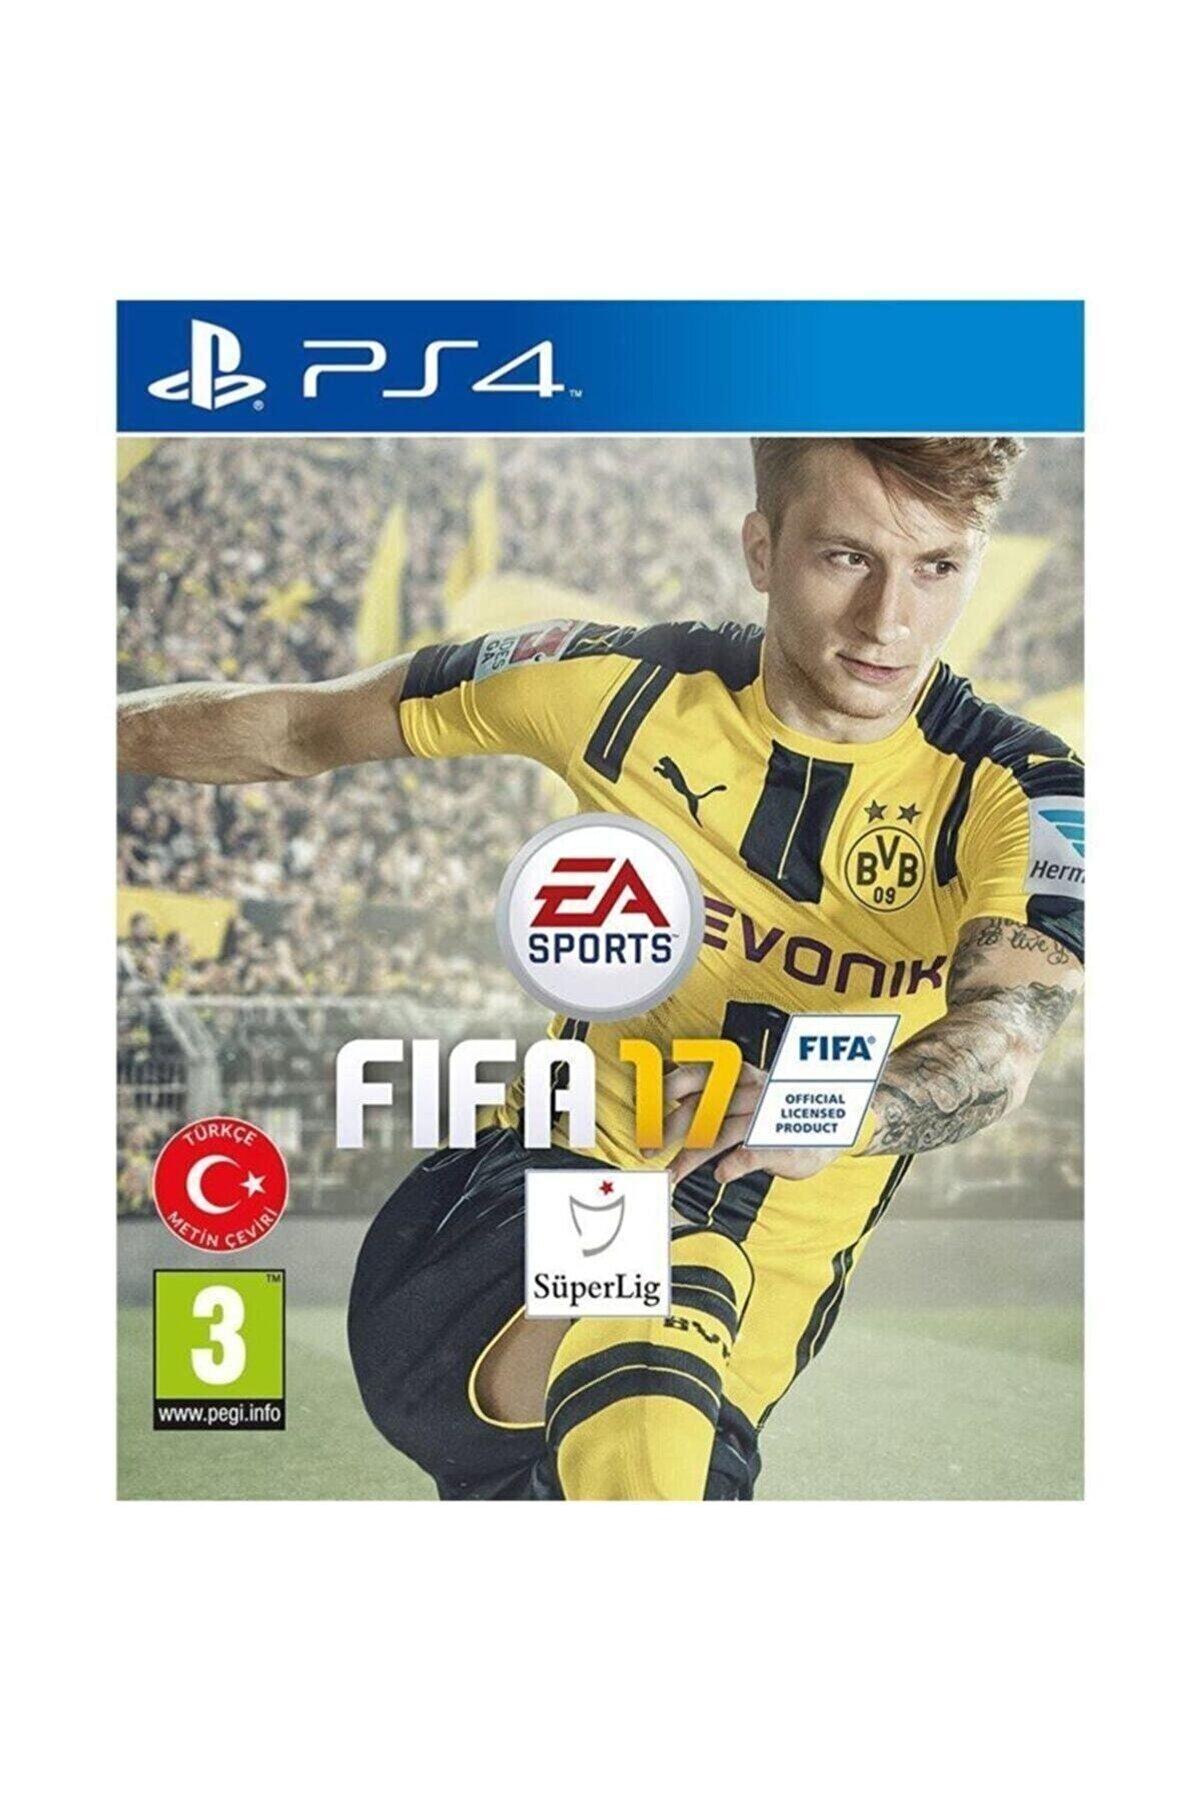 Electronic Arts Fifa 17 Fifa 2017 Türkçe Menü Ps4 Oyun